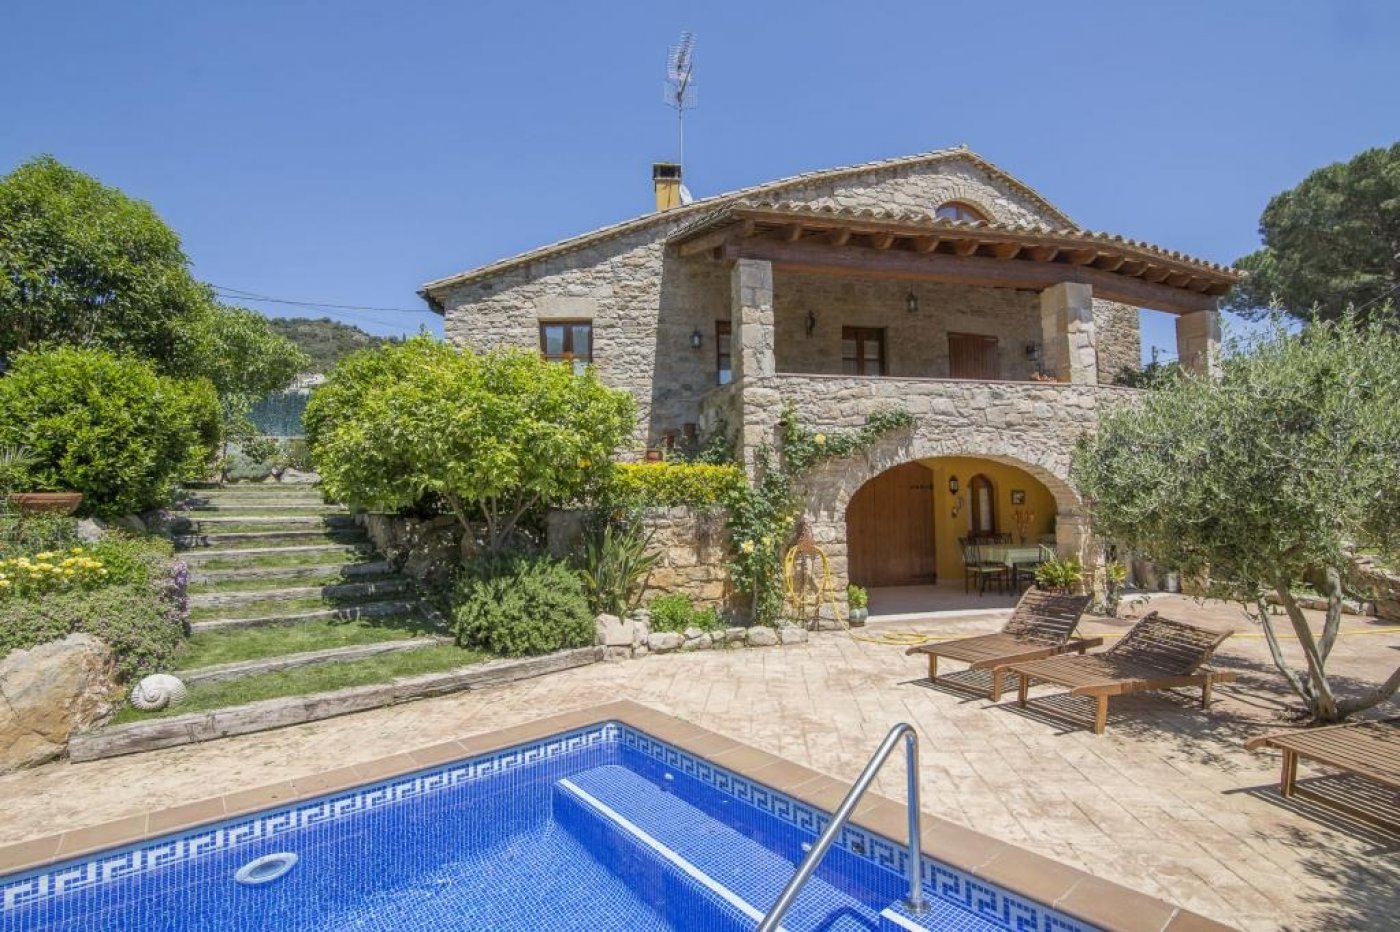 Casa  Girona ,calonge. Casa (unifamiliar aislada): calonge (girona) mas ambrós